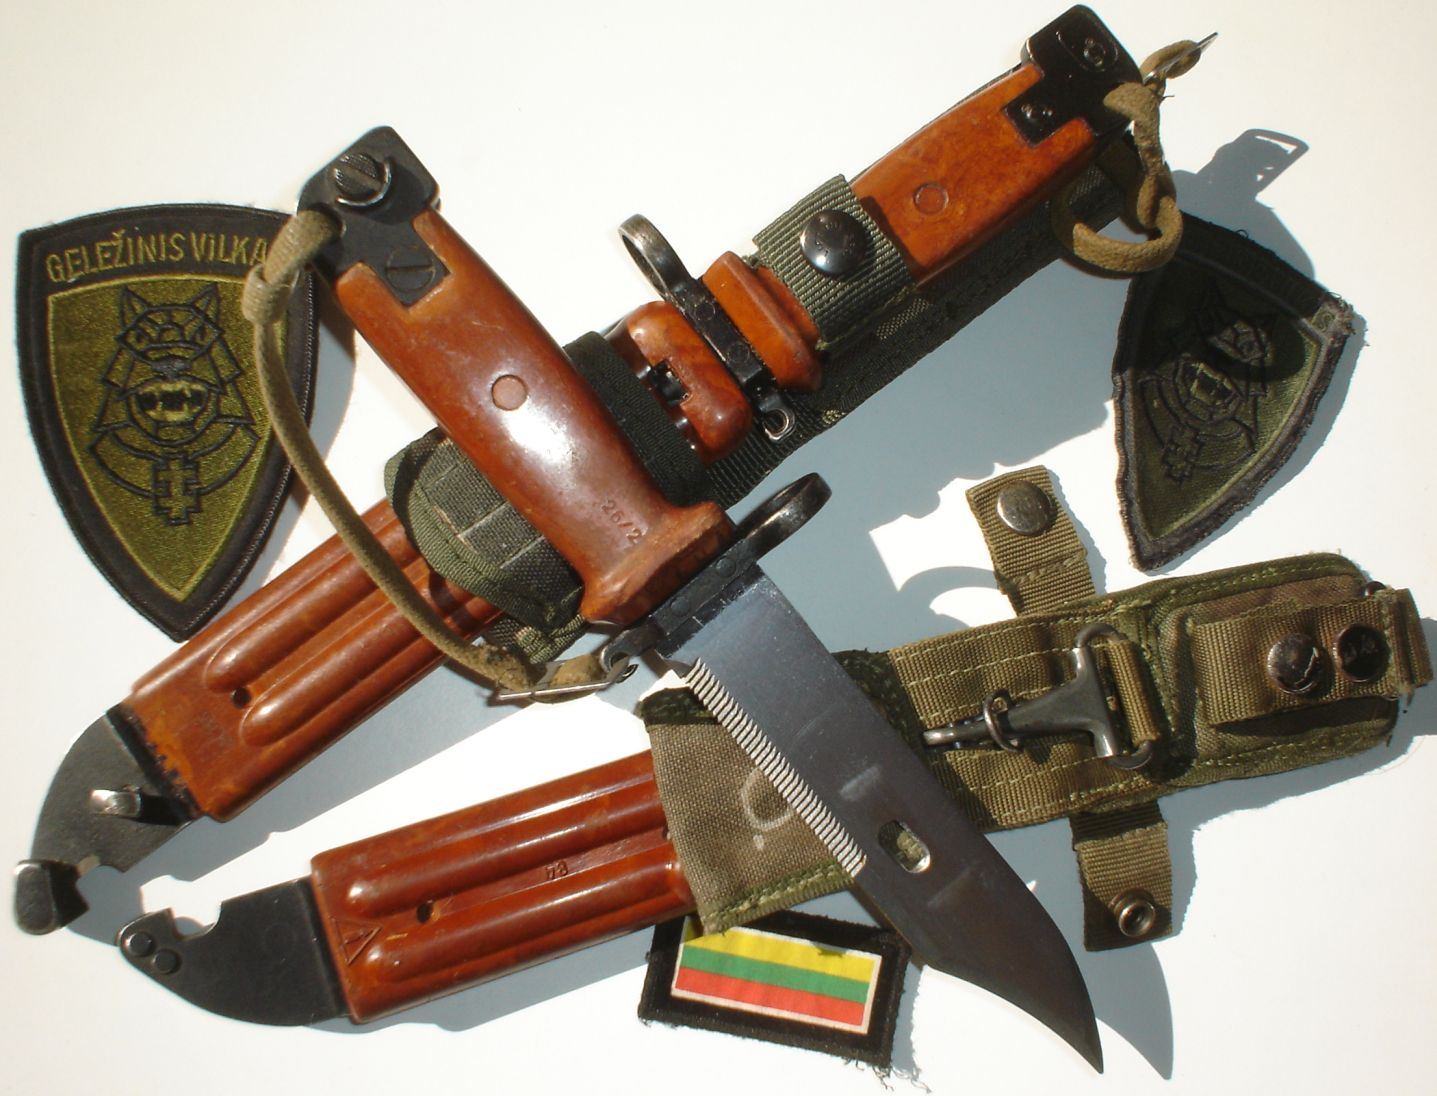 Ak47 Bayonets Page 2